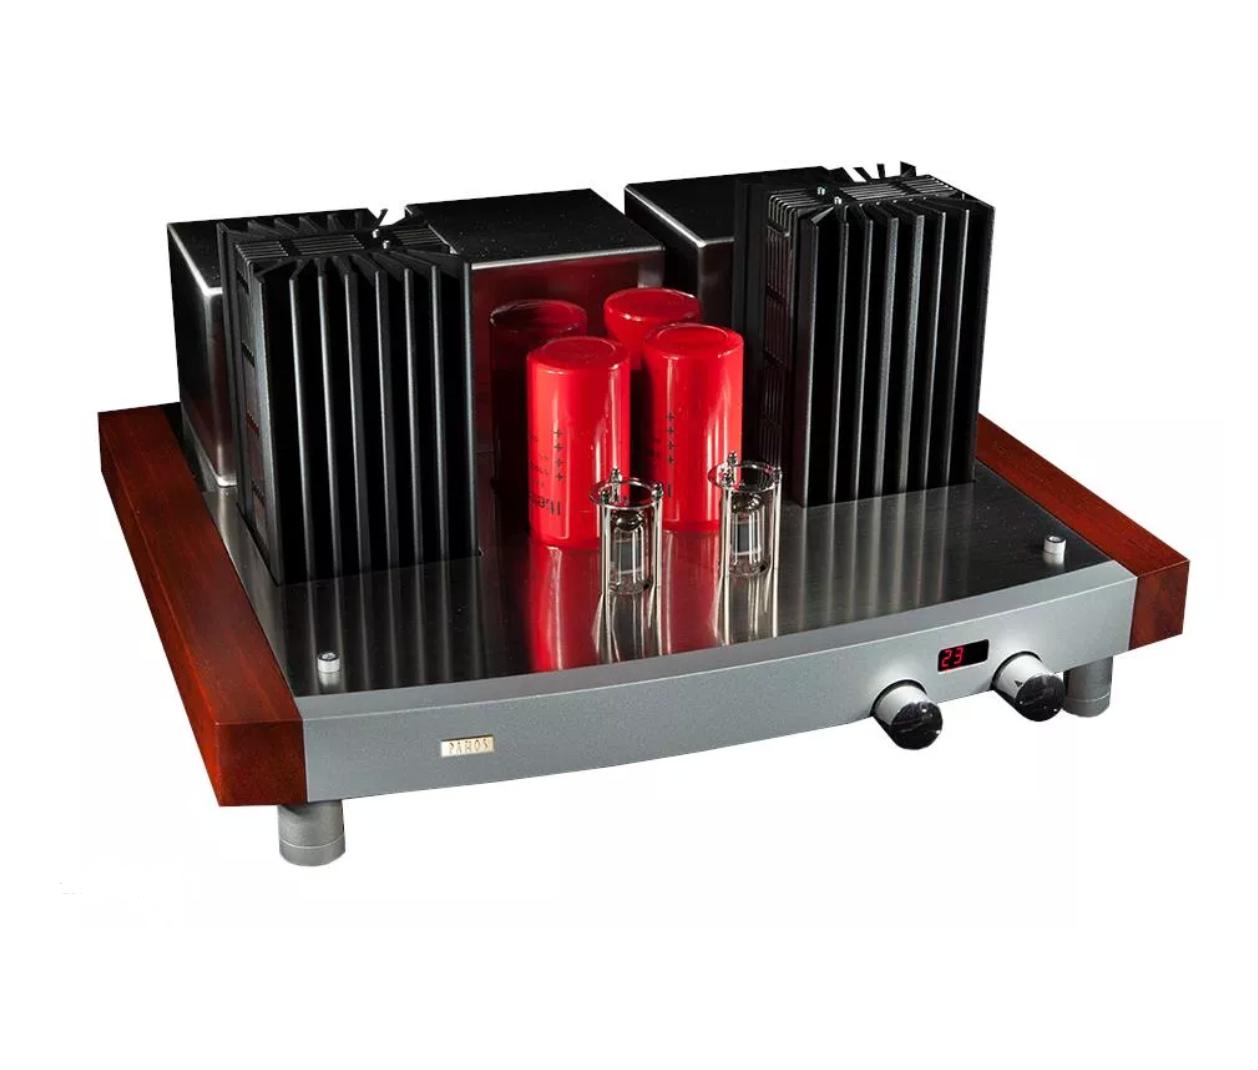 Pathos TT Anniversary Tube Hybrid Integrated Amplifier